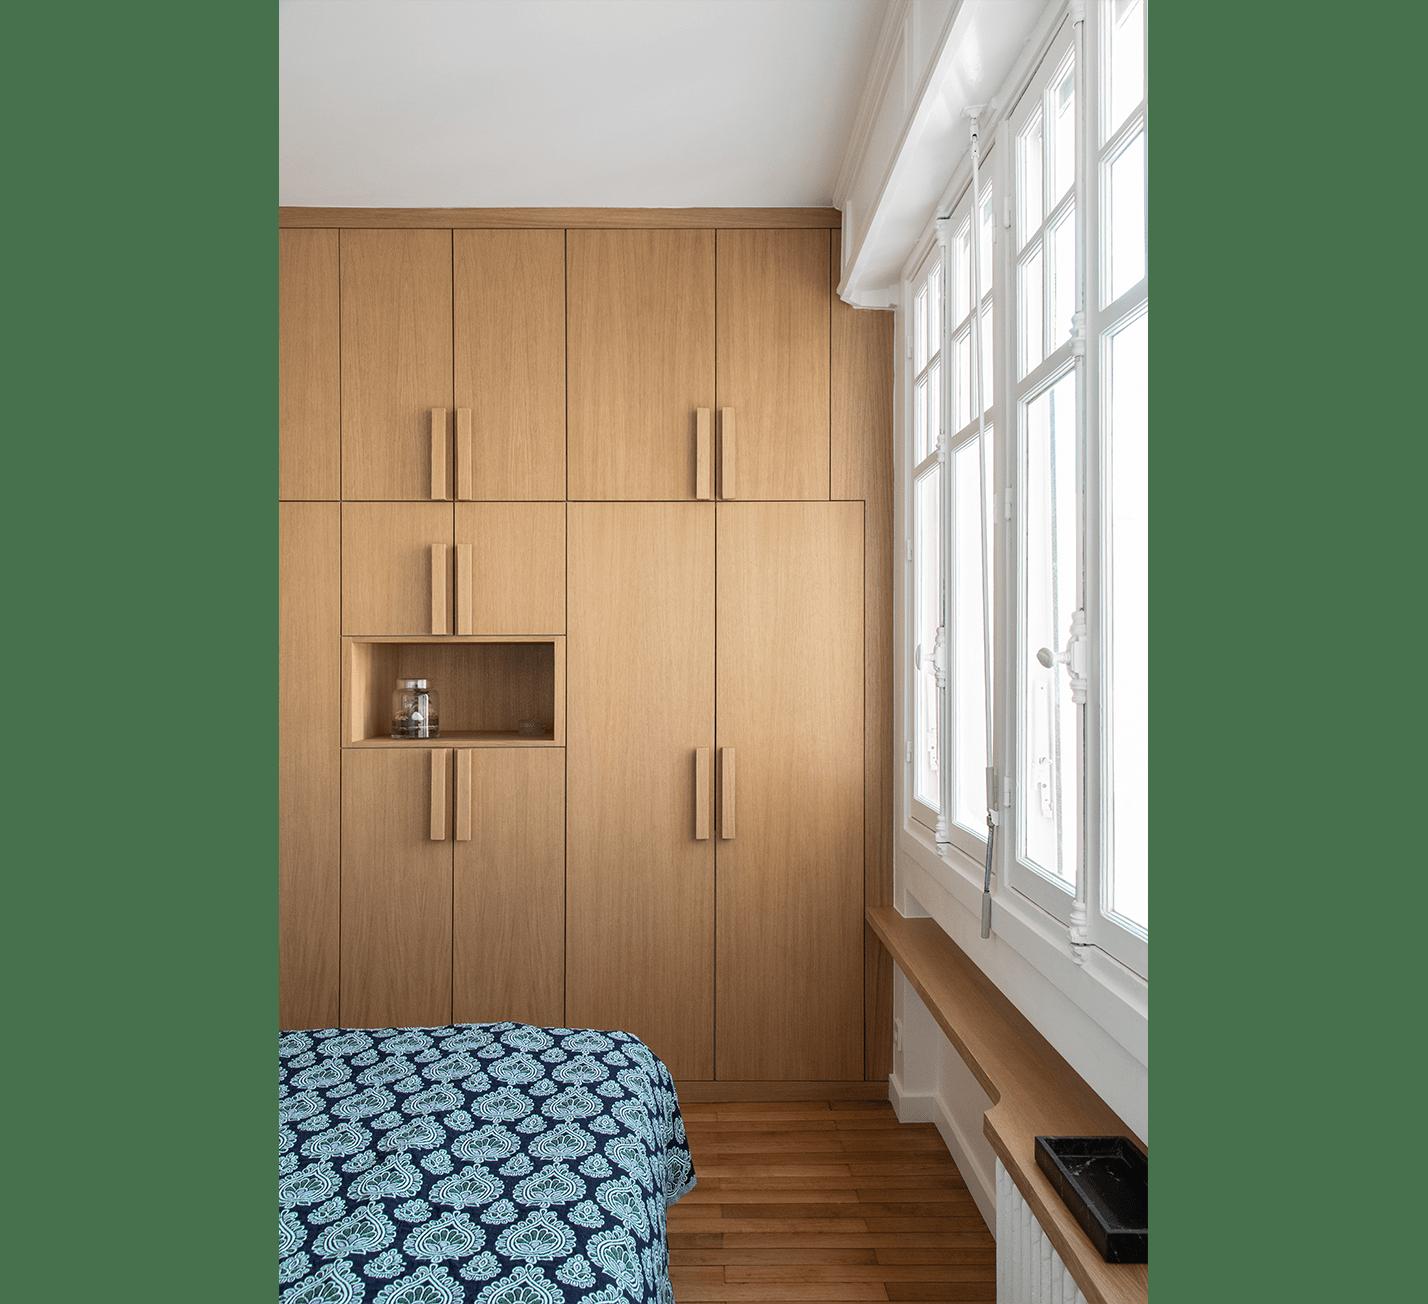 Projet-Emile-Atelier-Steve-Pauline-Borgia-Architecte-interieur-10-min